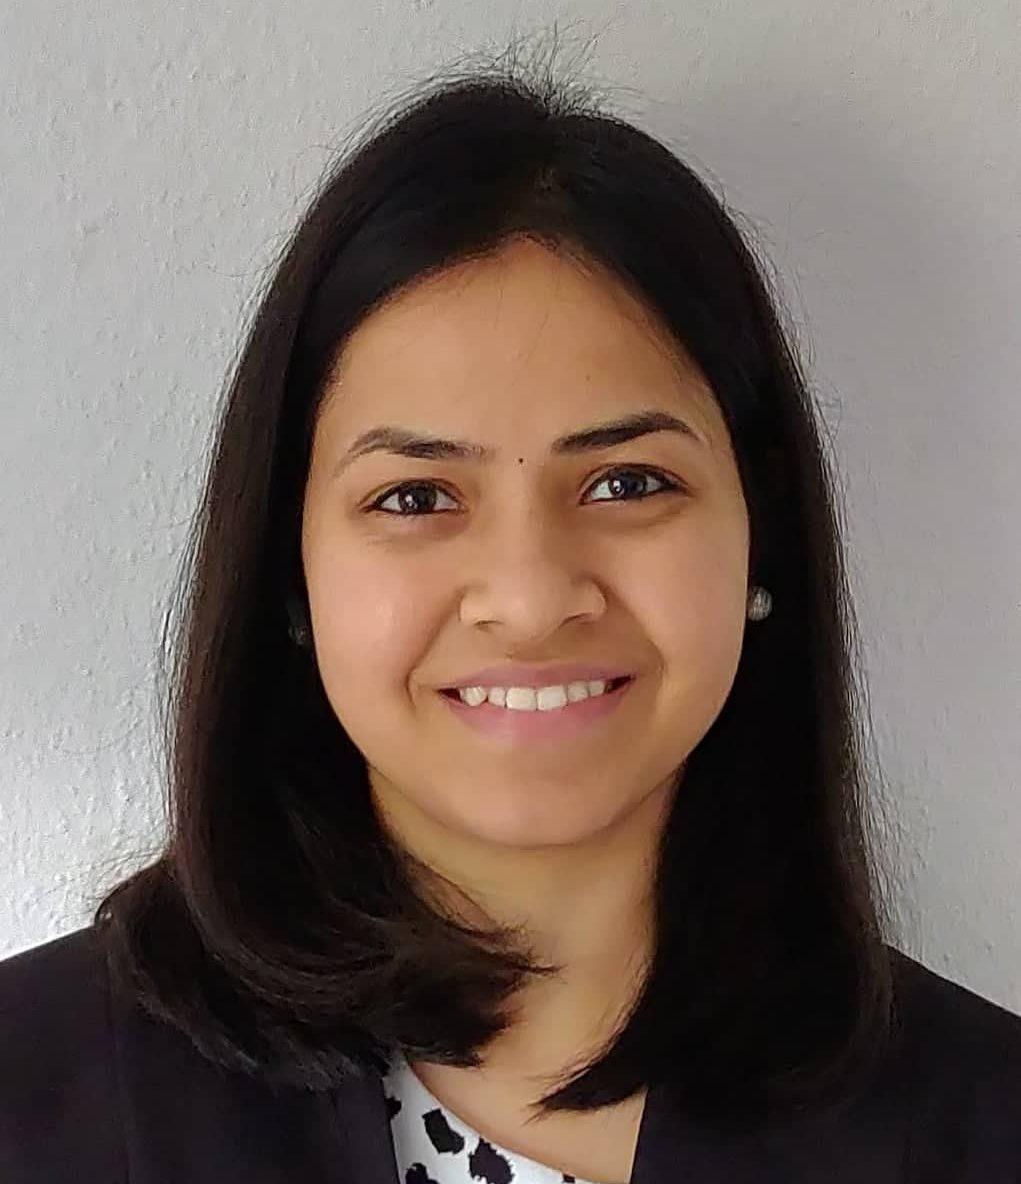 Aathmaja Anandhi Rangarajan : Postdoctoral Scholar